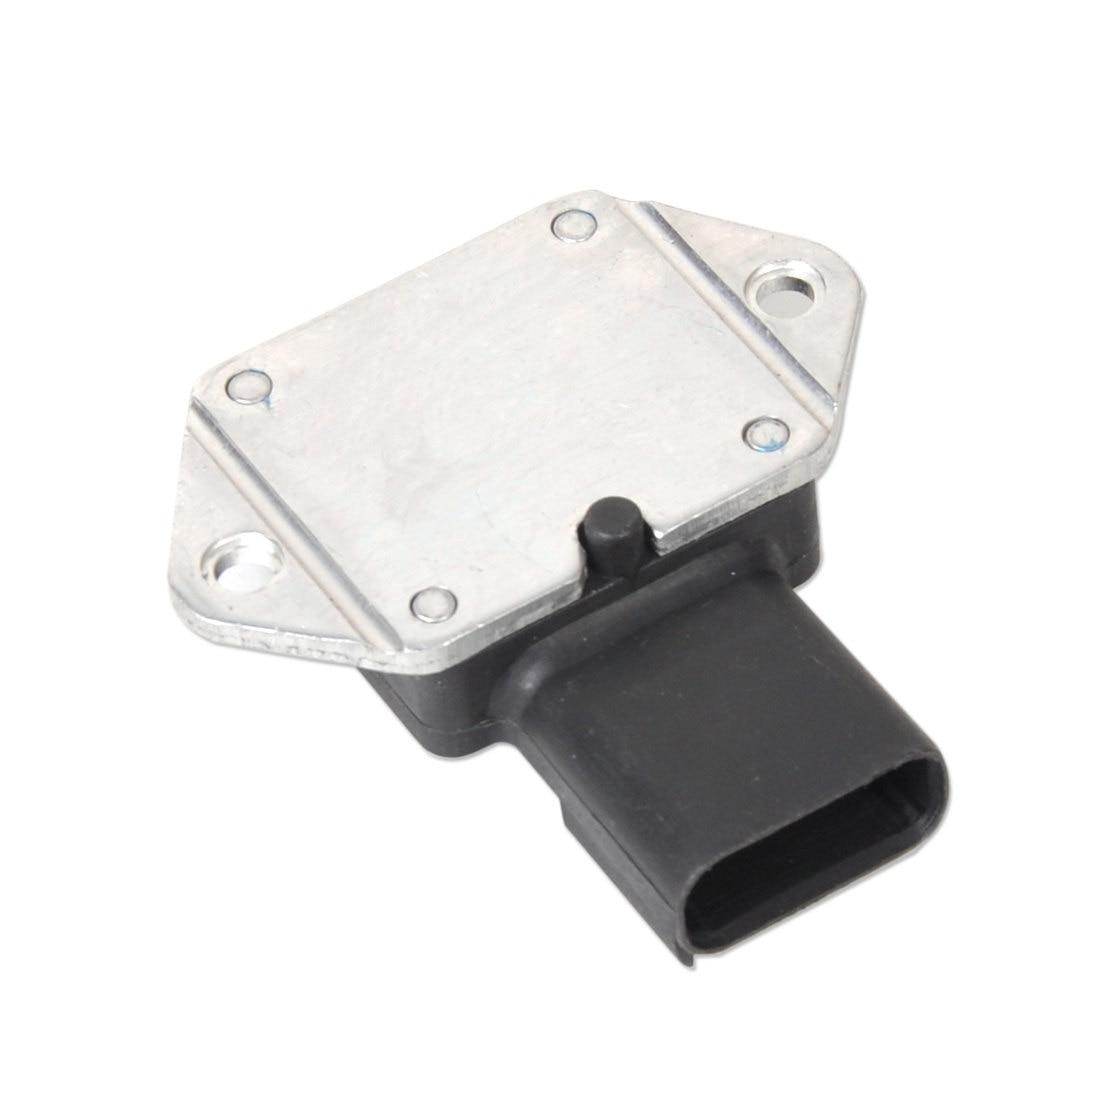 dwcx car radiator cooling fan relay ry330t 4707286af for jeep grand cherokee chrysler voyager dodge caravan [ 1110 x 1110 Pixel ]